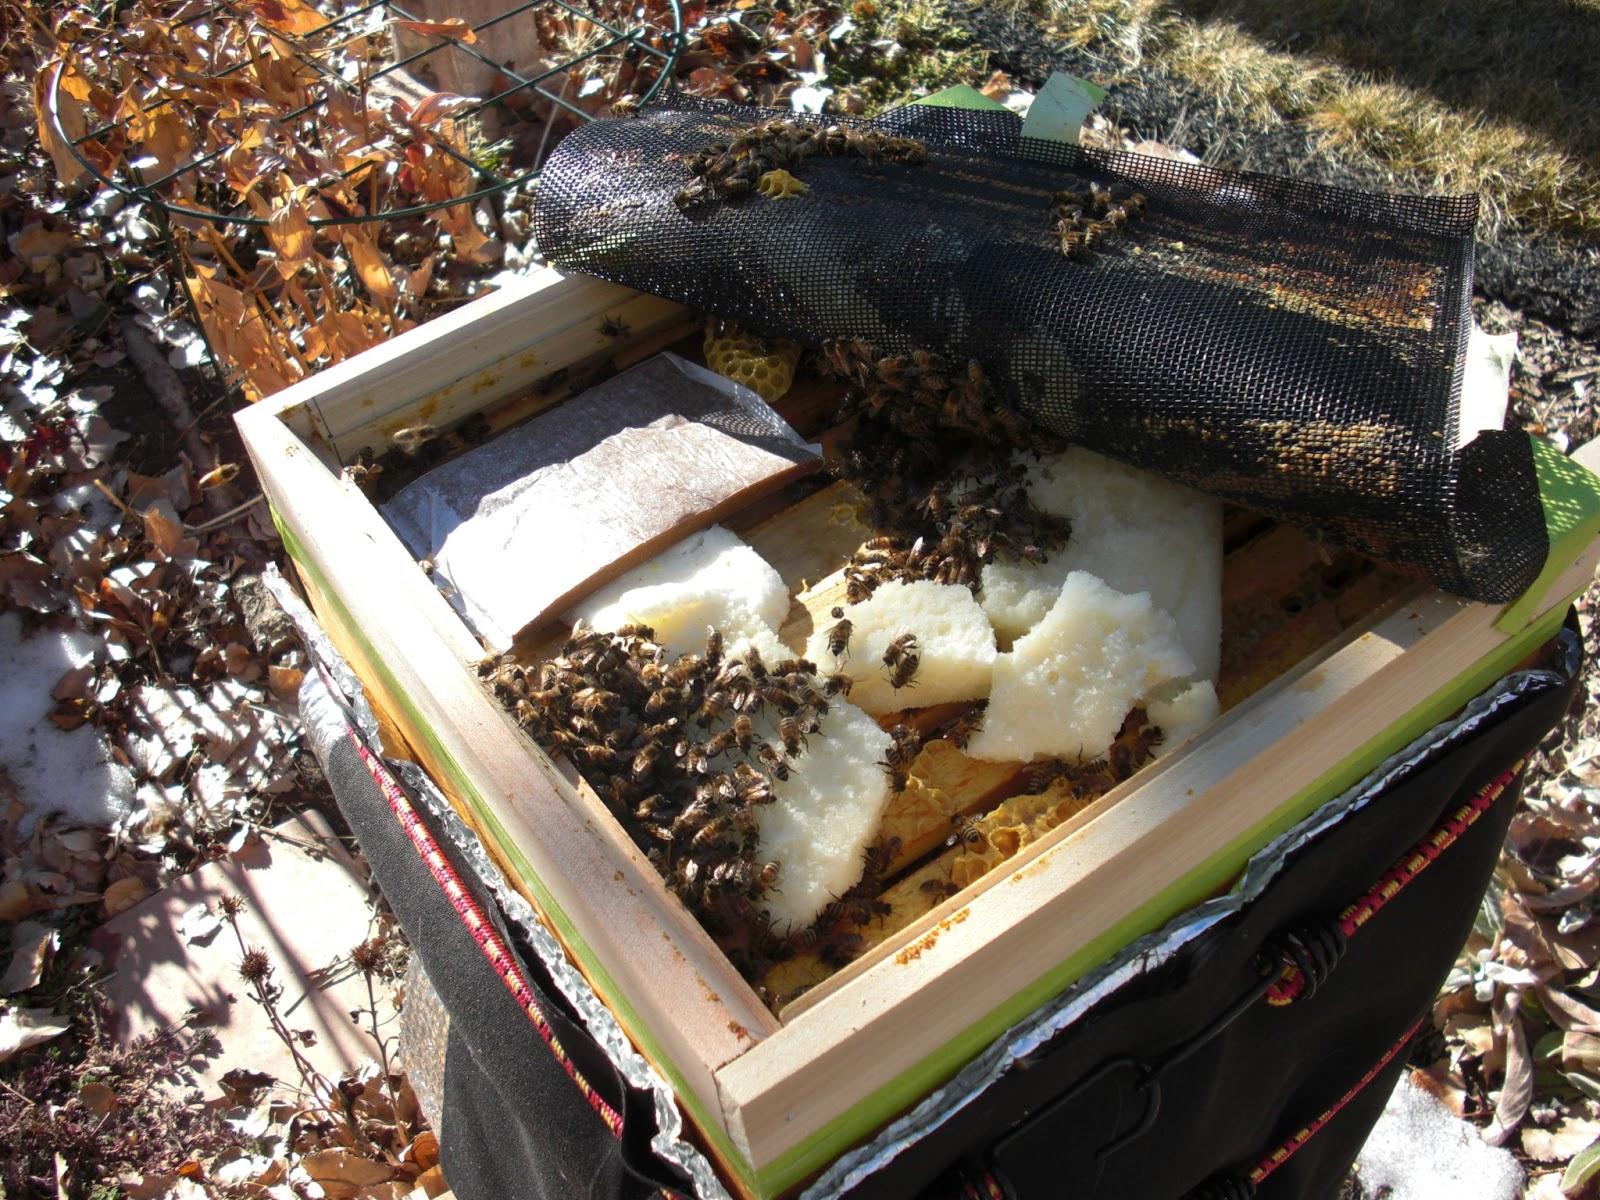 backyard bee hive blog january 2013